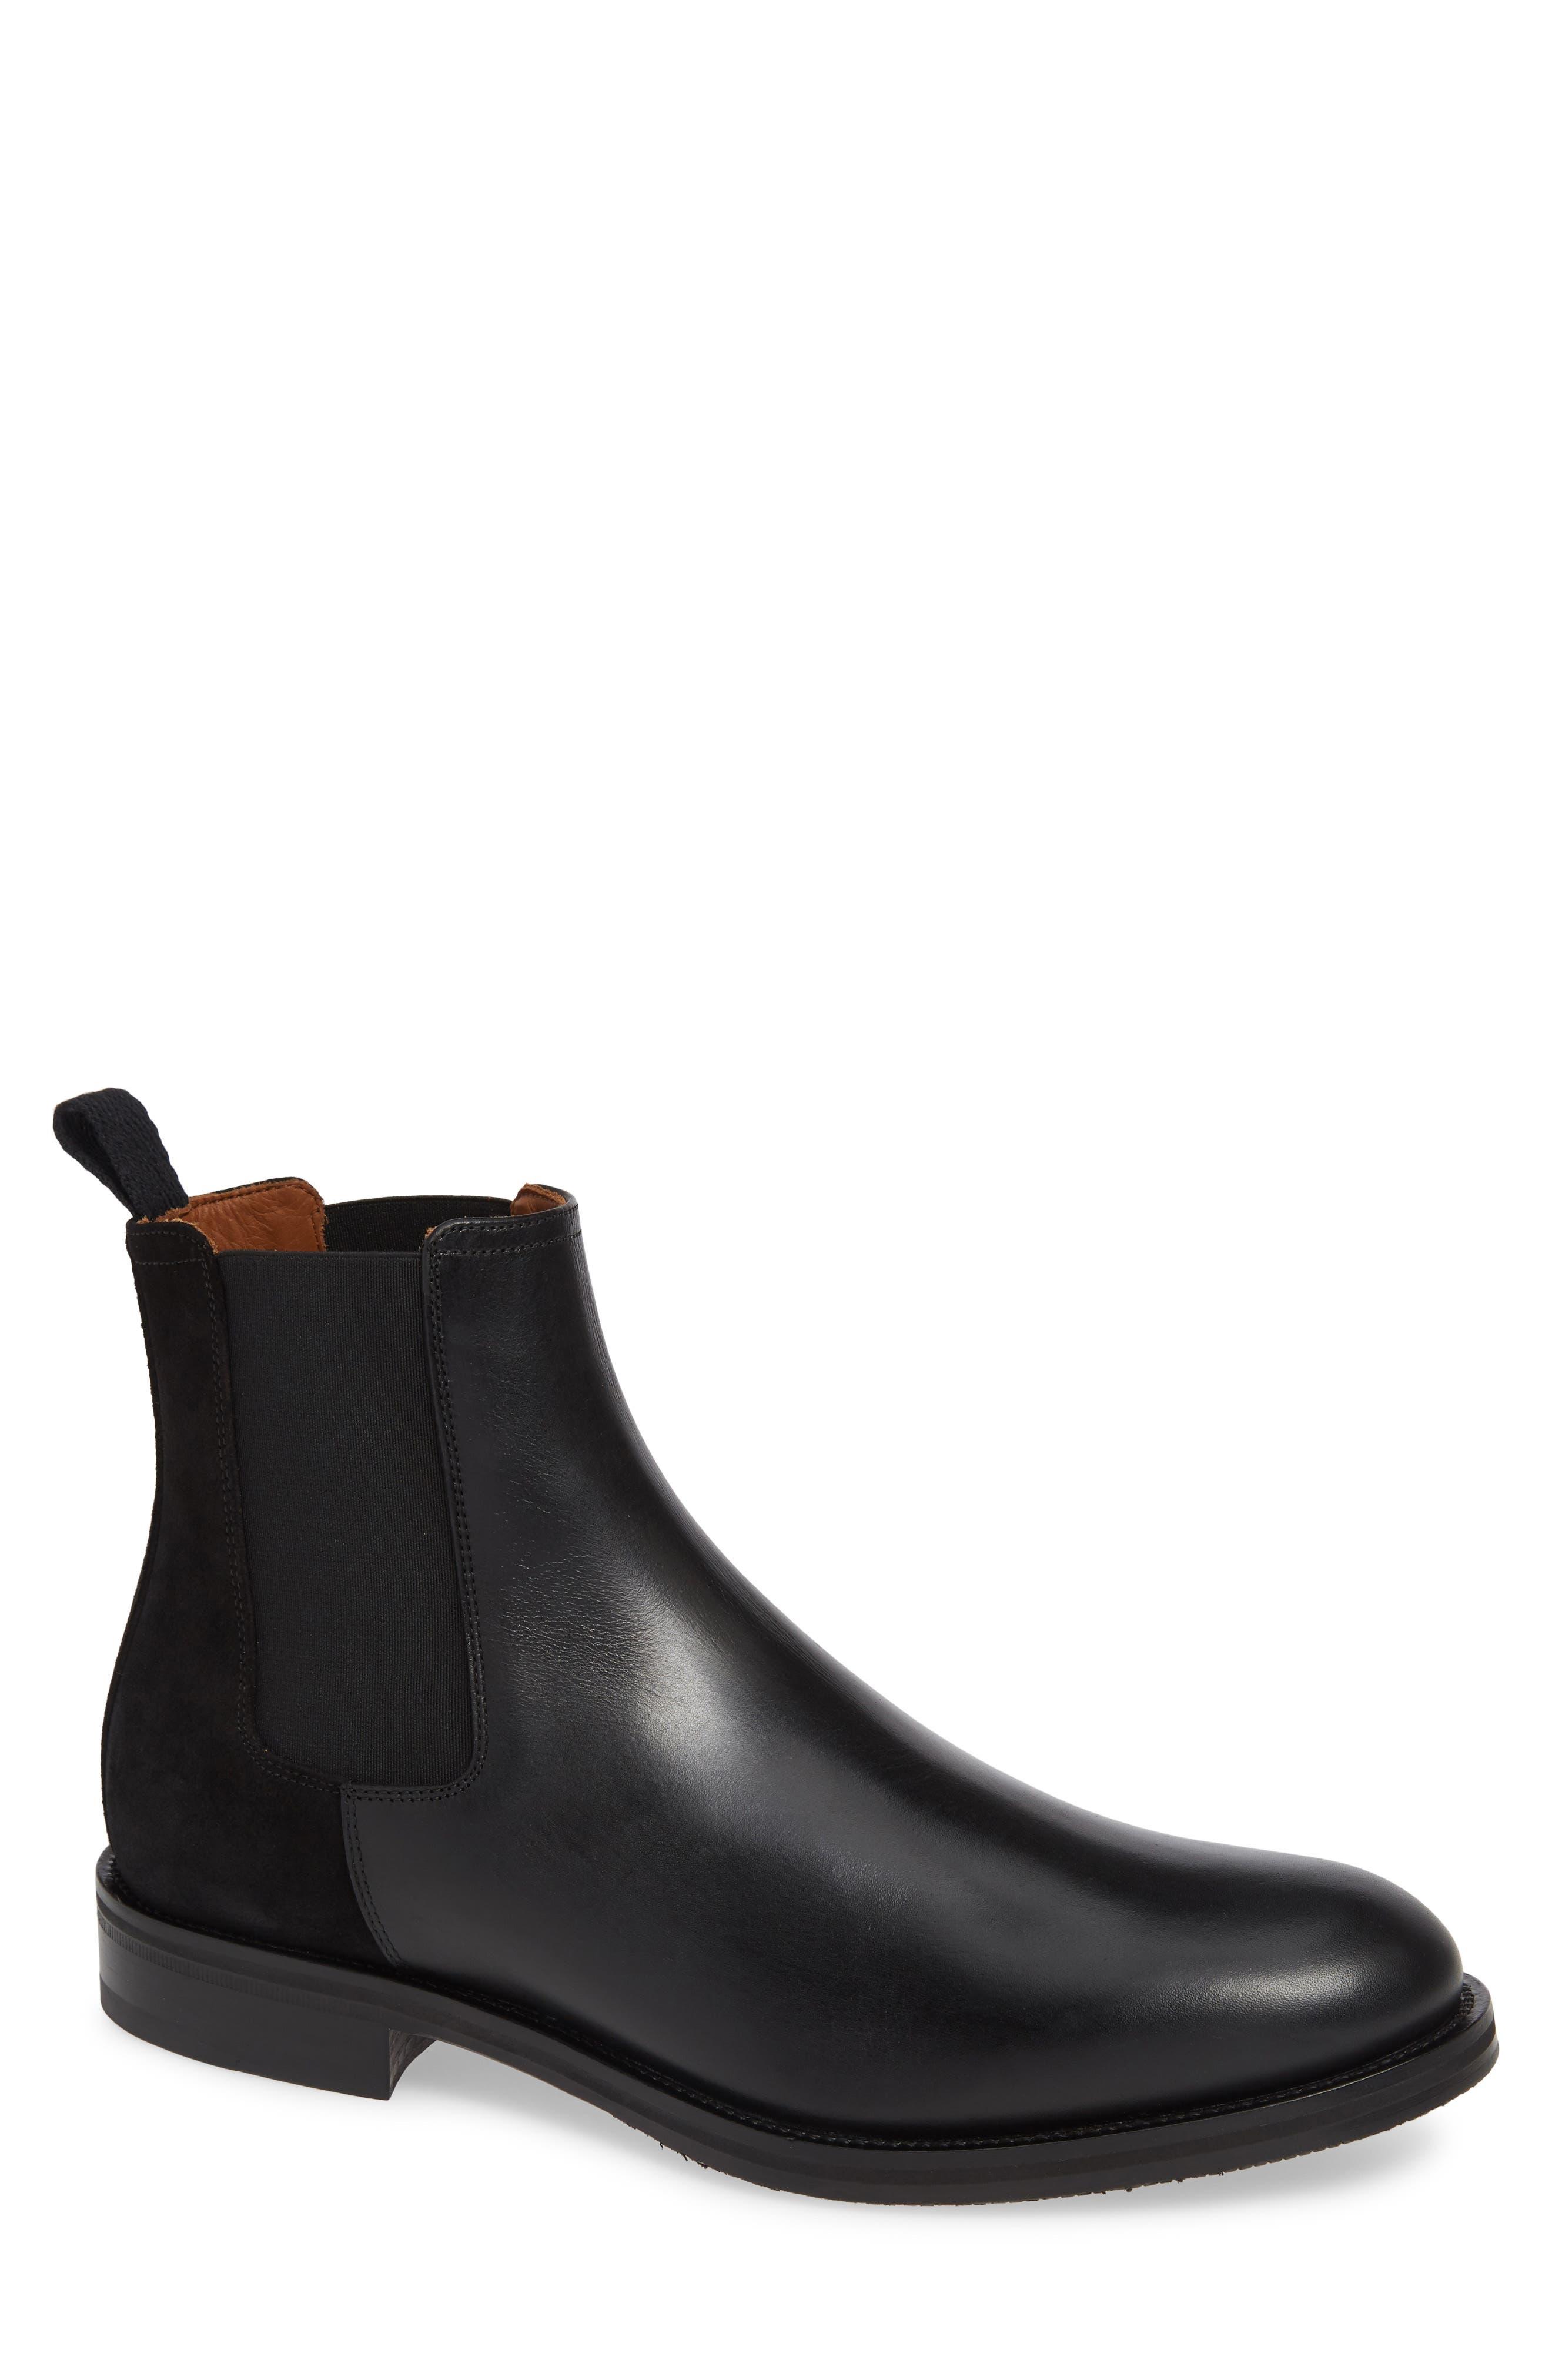 Giancarlo Weatherproof Chelsea Boot, Main, color, BLACK